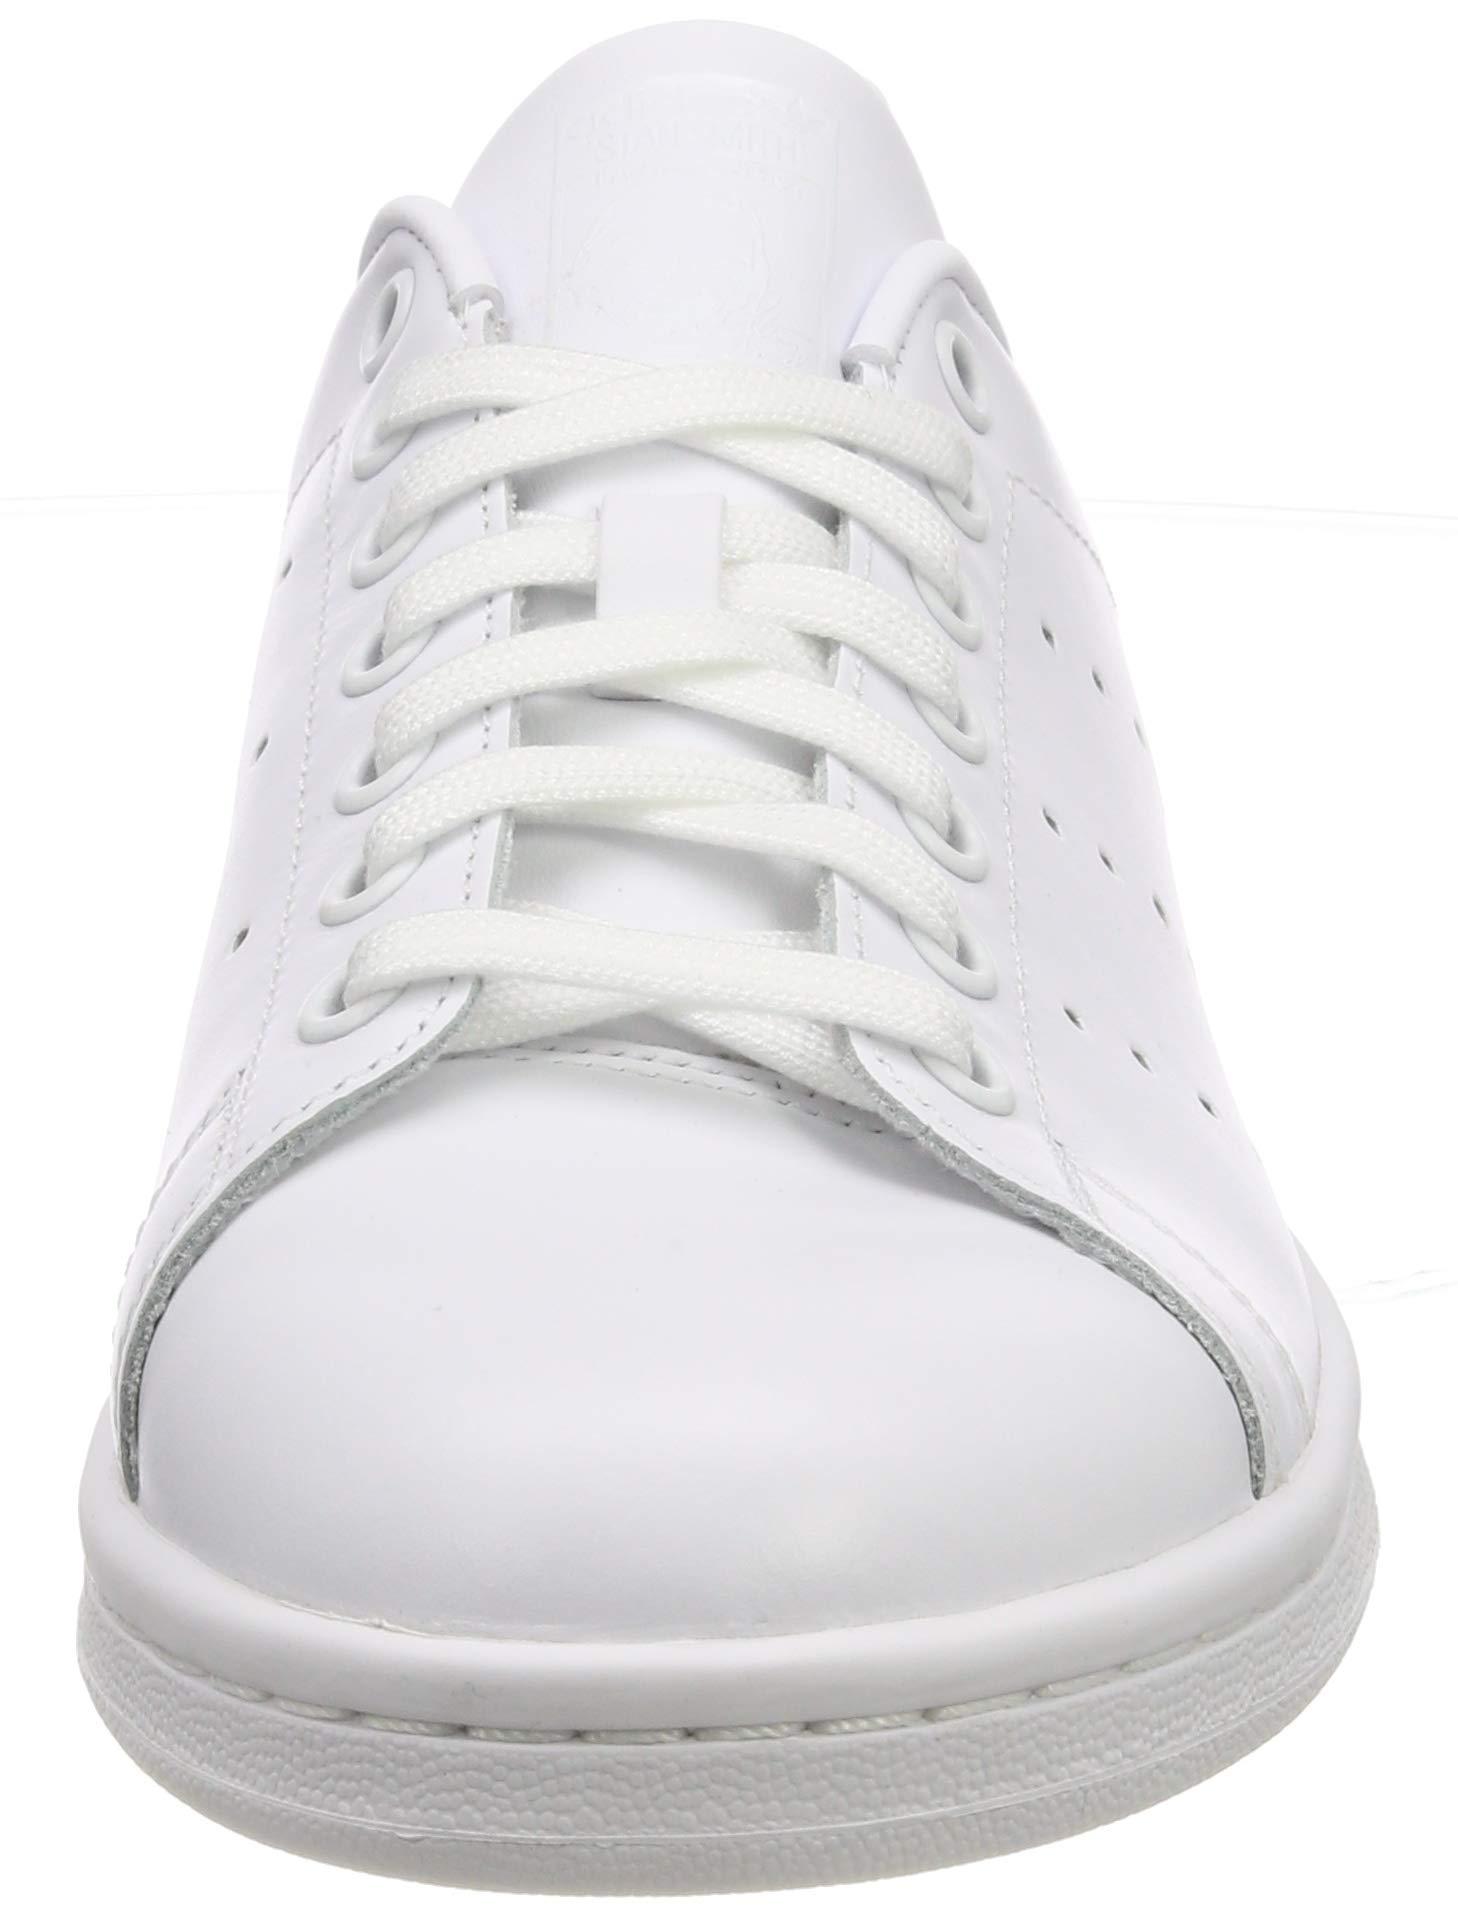 adidas stan smith scarpe low-top unisex adulto